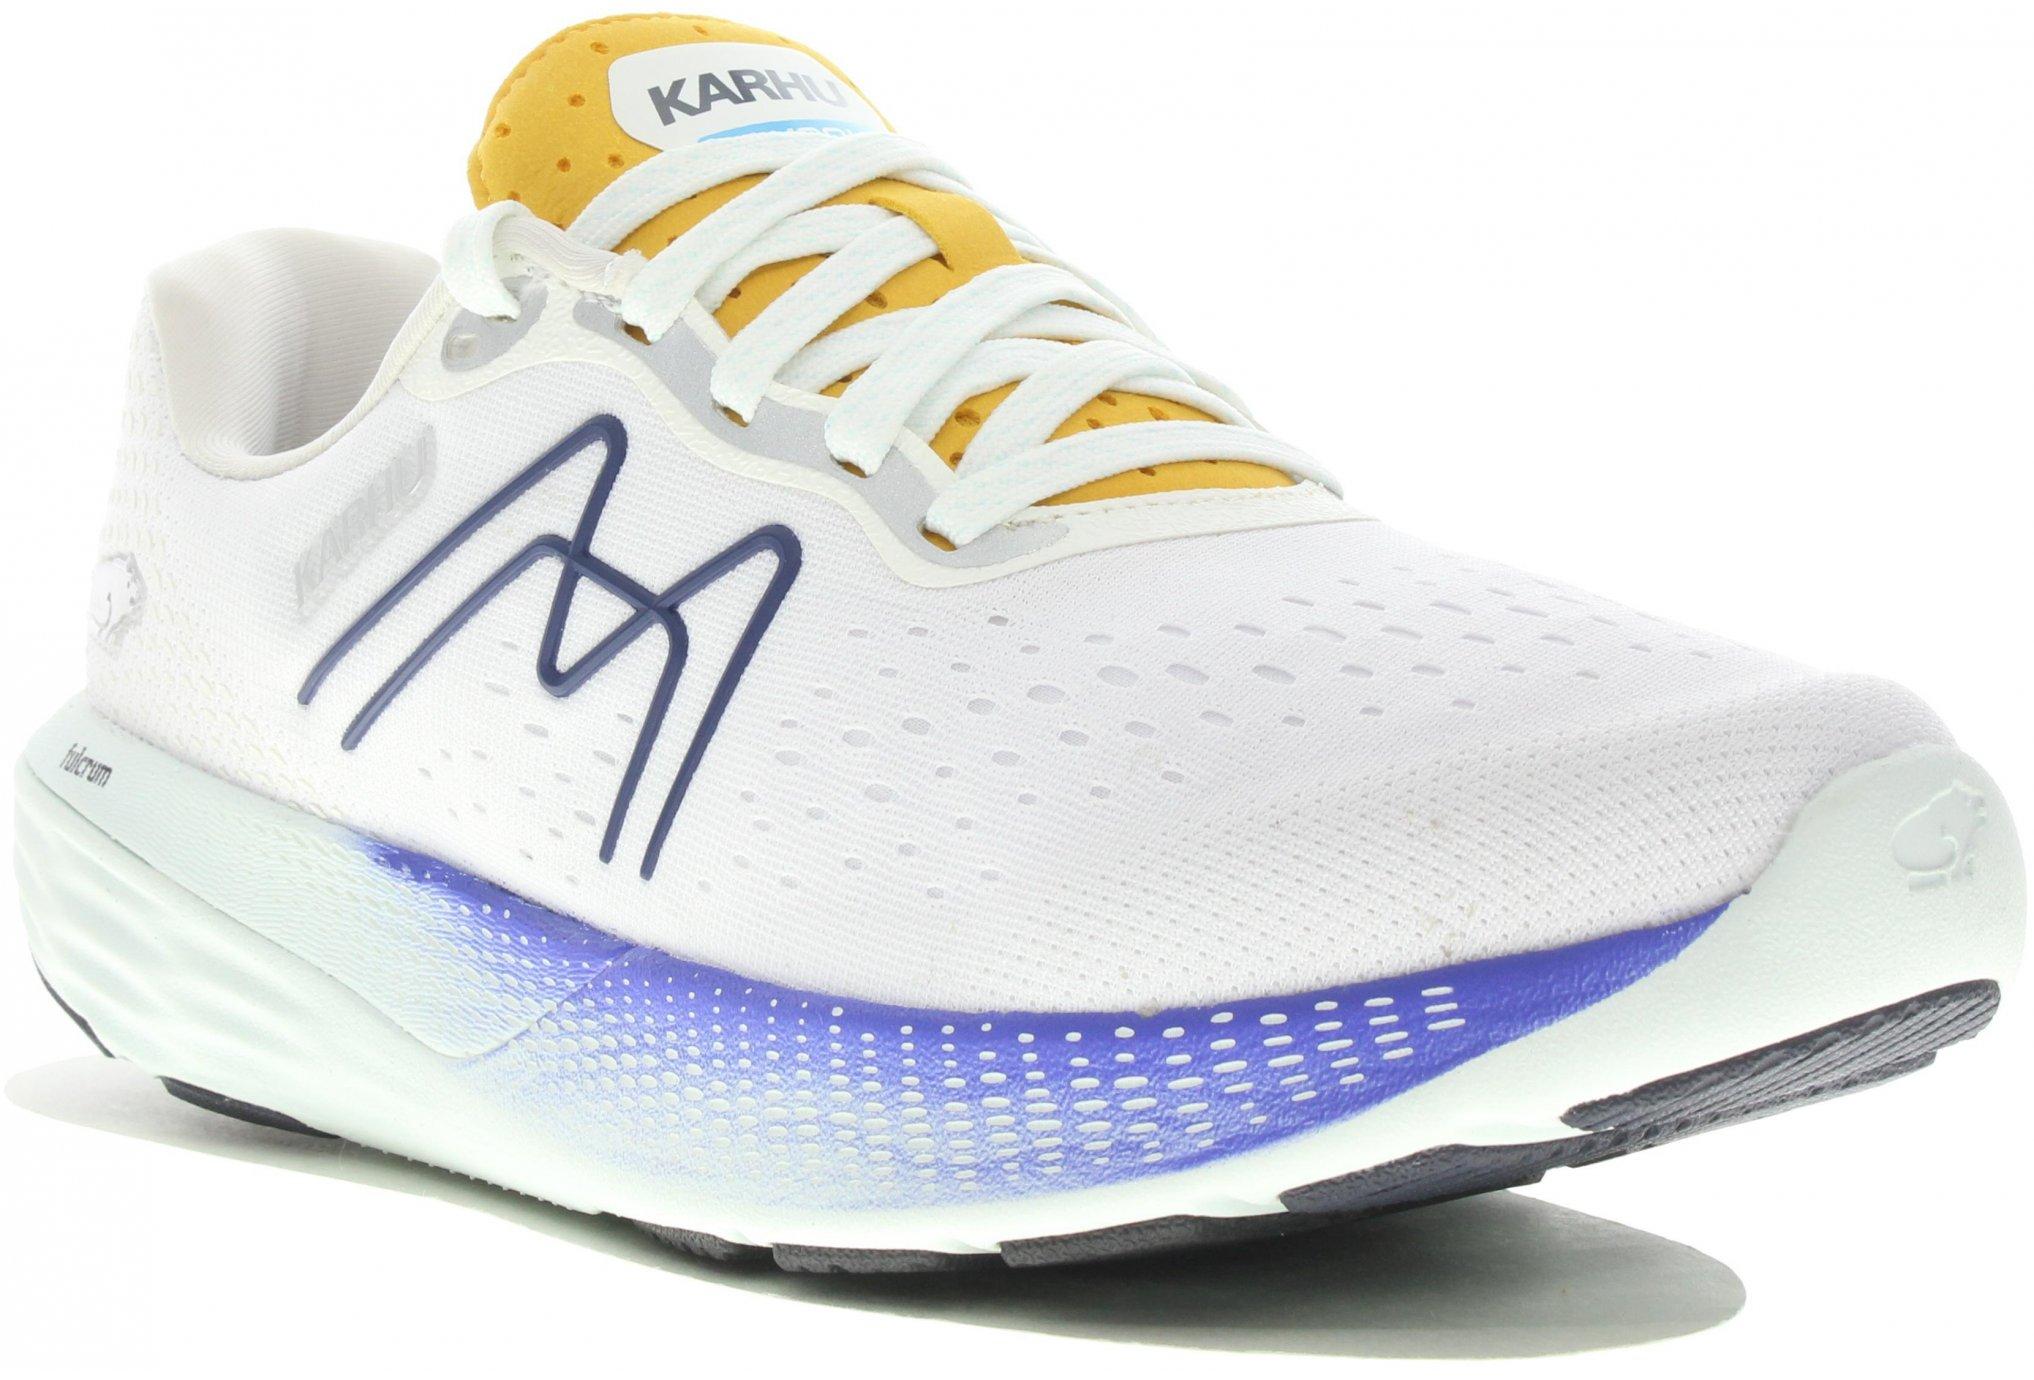 Karhu Ikoni Ortix Sun Run W Chaussures running femme